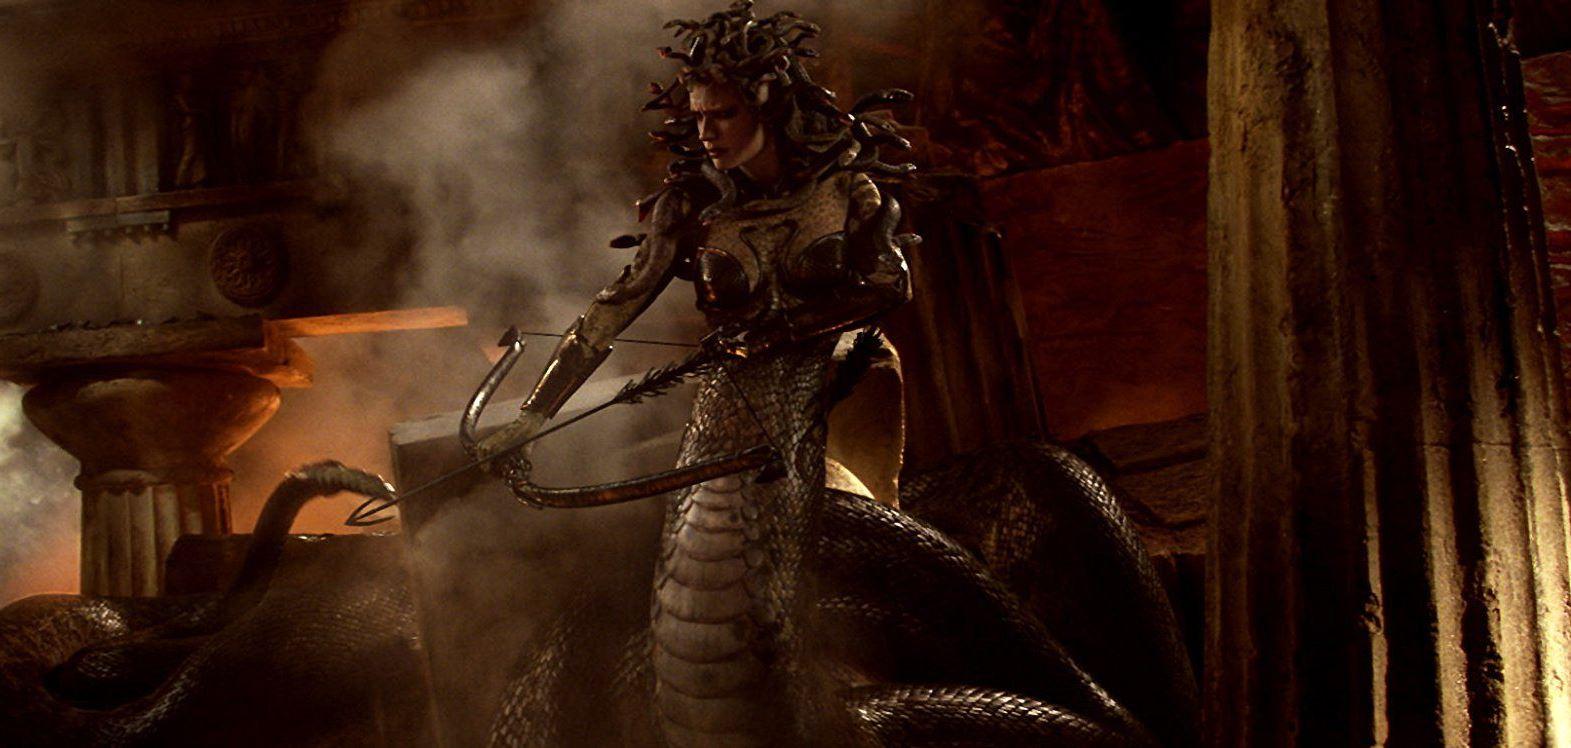 A CGI Medusa in Clash of the Titans (2010)